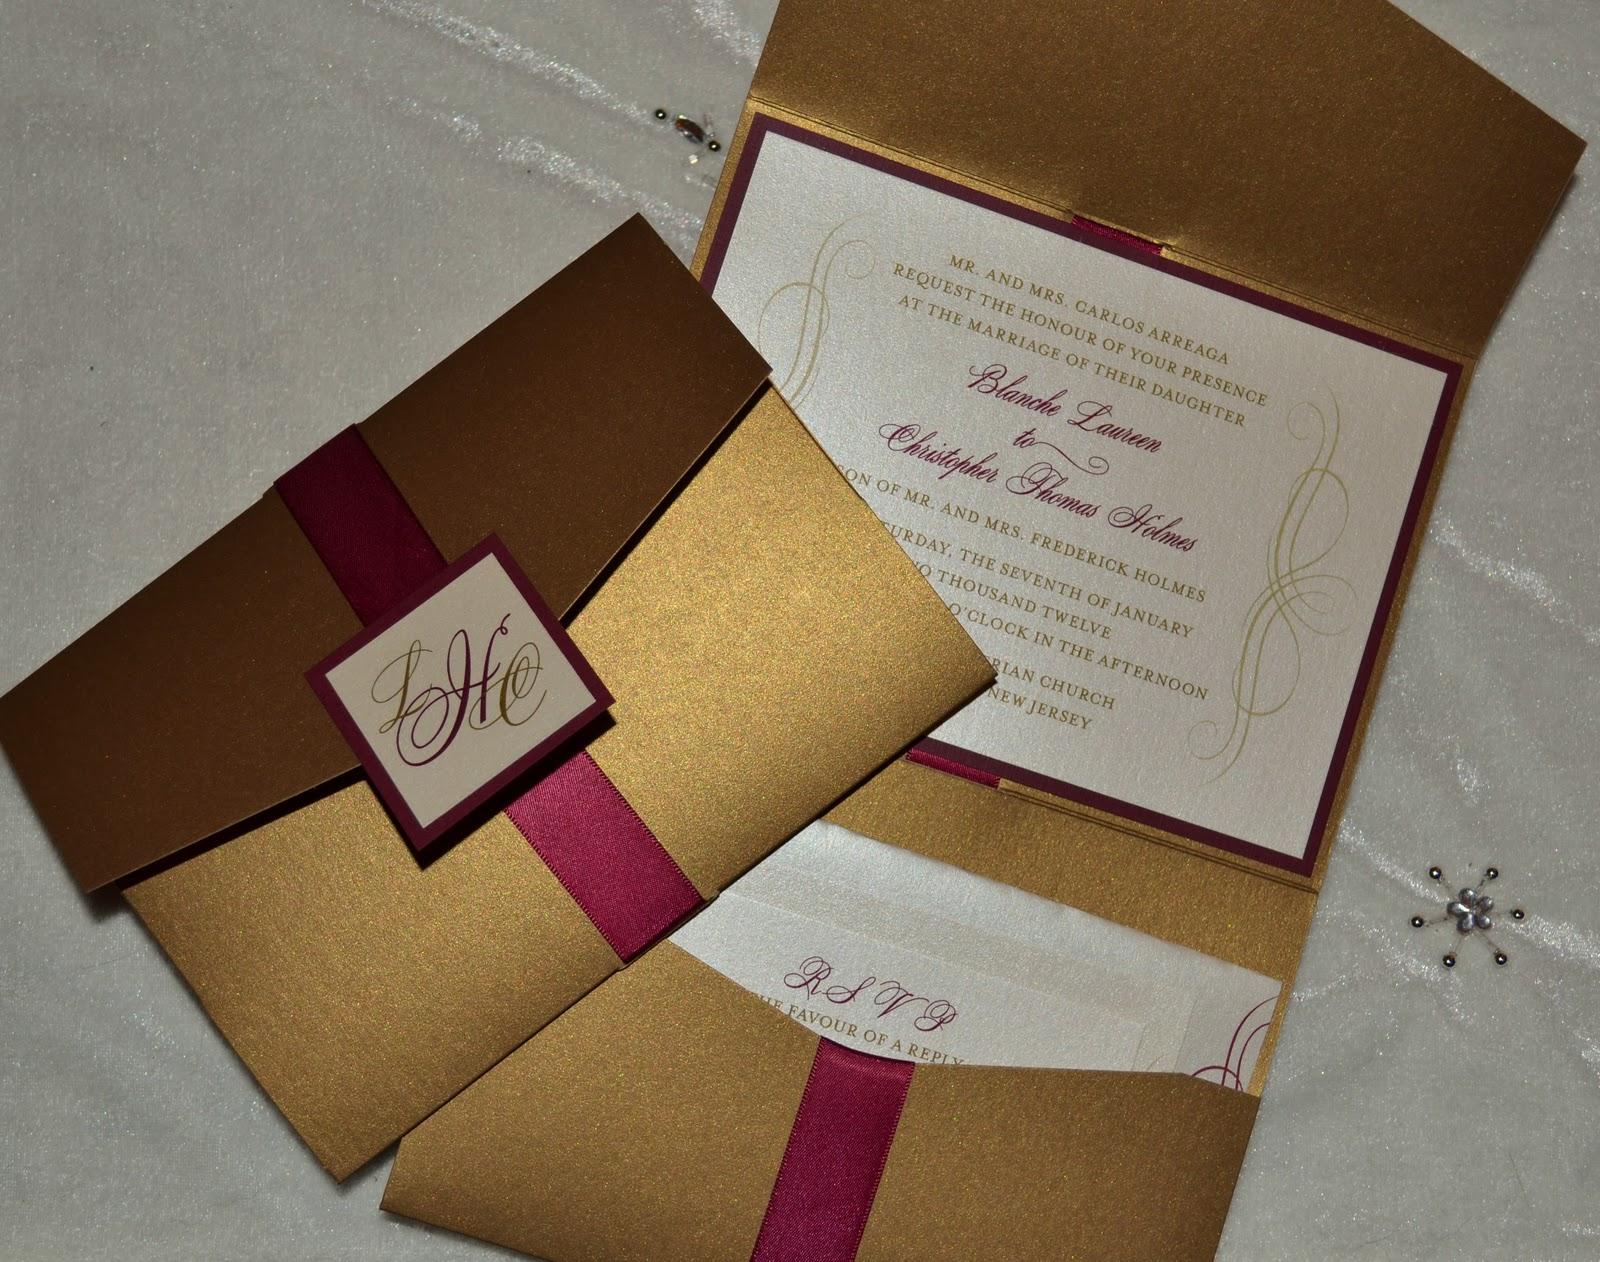 burgundy wedding invitations Google Image Result for http 3 bp blogspot com Uszfrr10bpc TxJBIRYfsbI AAAAAAAAAgo toB 4 s DSC JPG my wedding ideas Pinterest